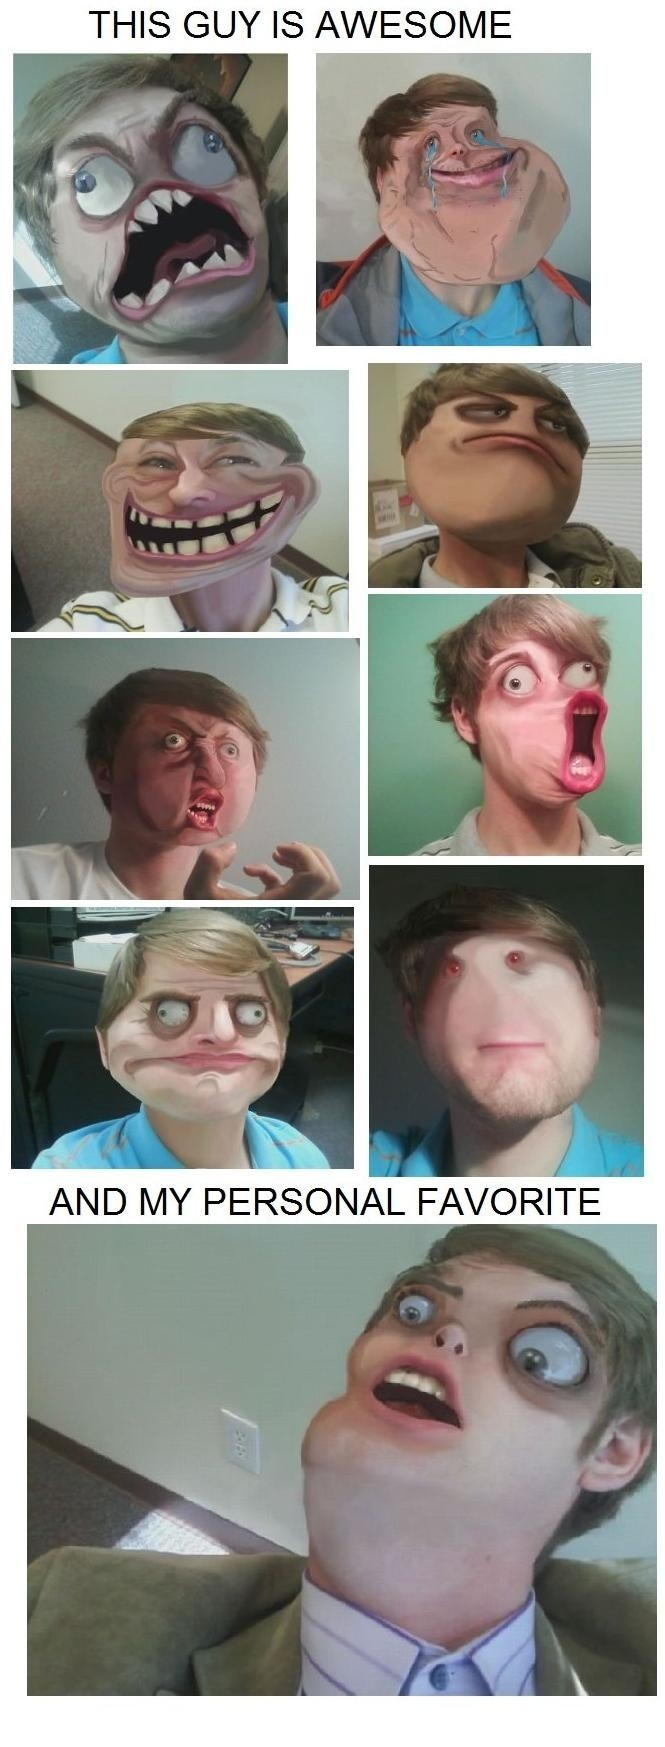 Preciso aprende a usa photoshop - meme